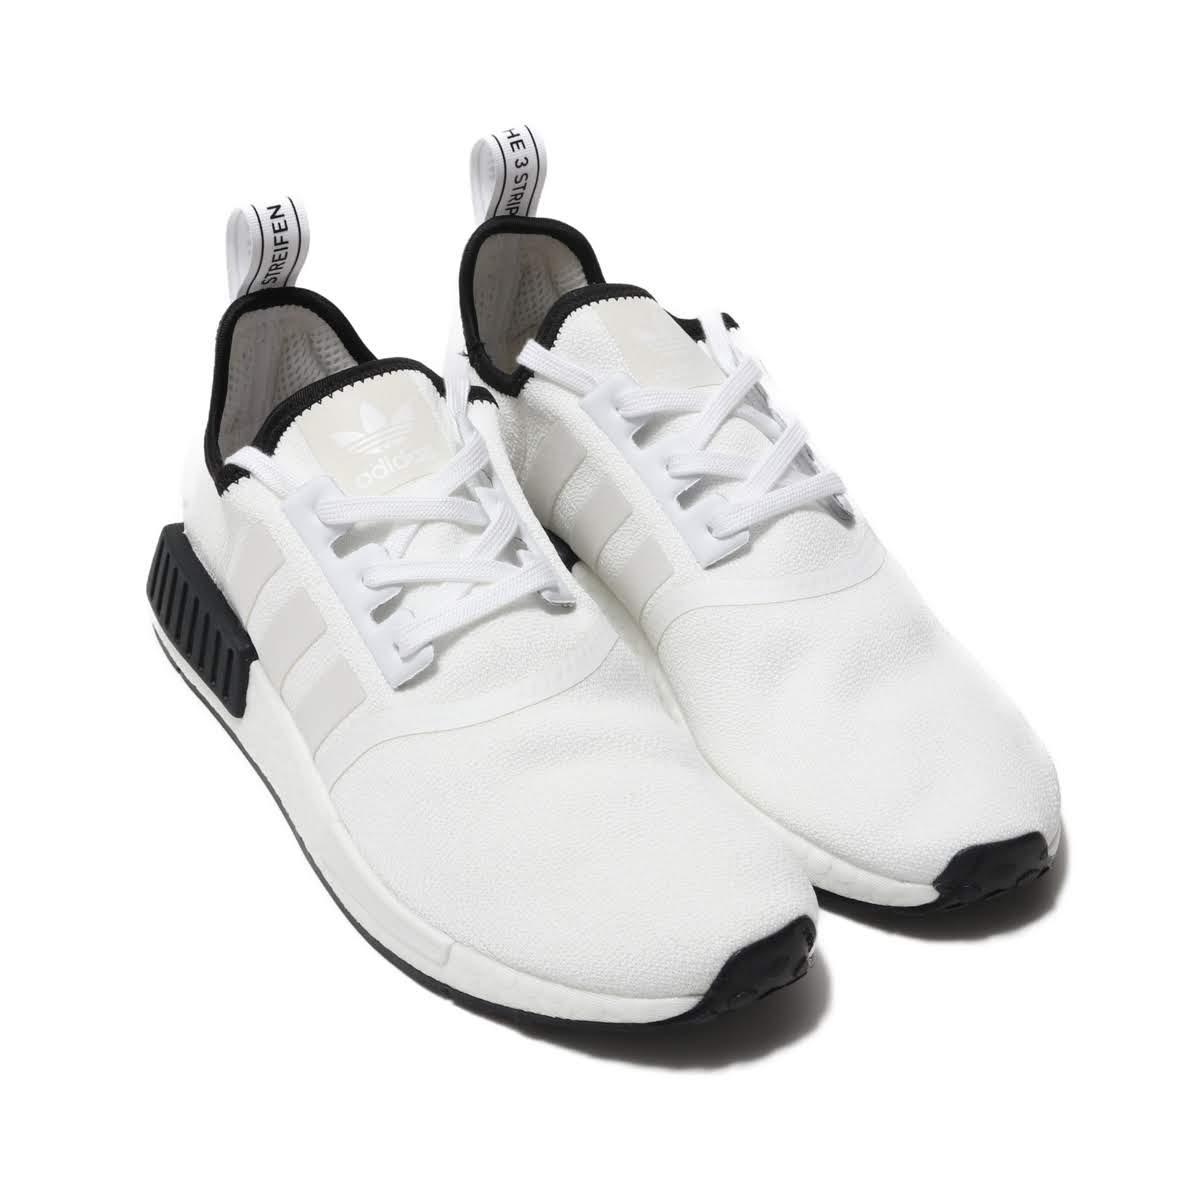 adidas Originals NMD_R1 (Adidas originals NMD_R1) FTWR WHITEFTWR WHITECORE BLACK 19SS I